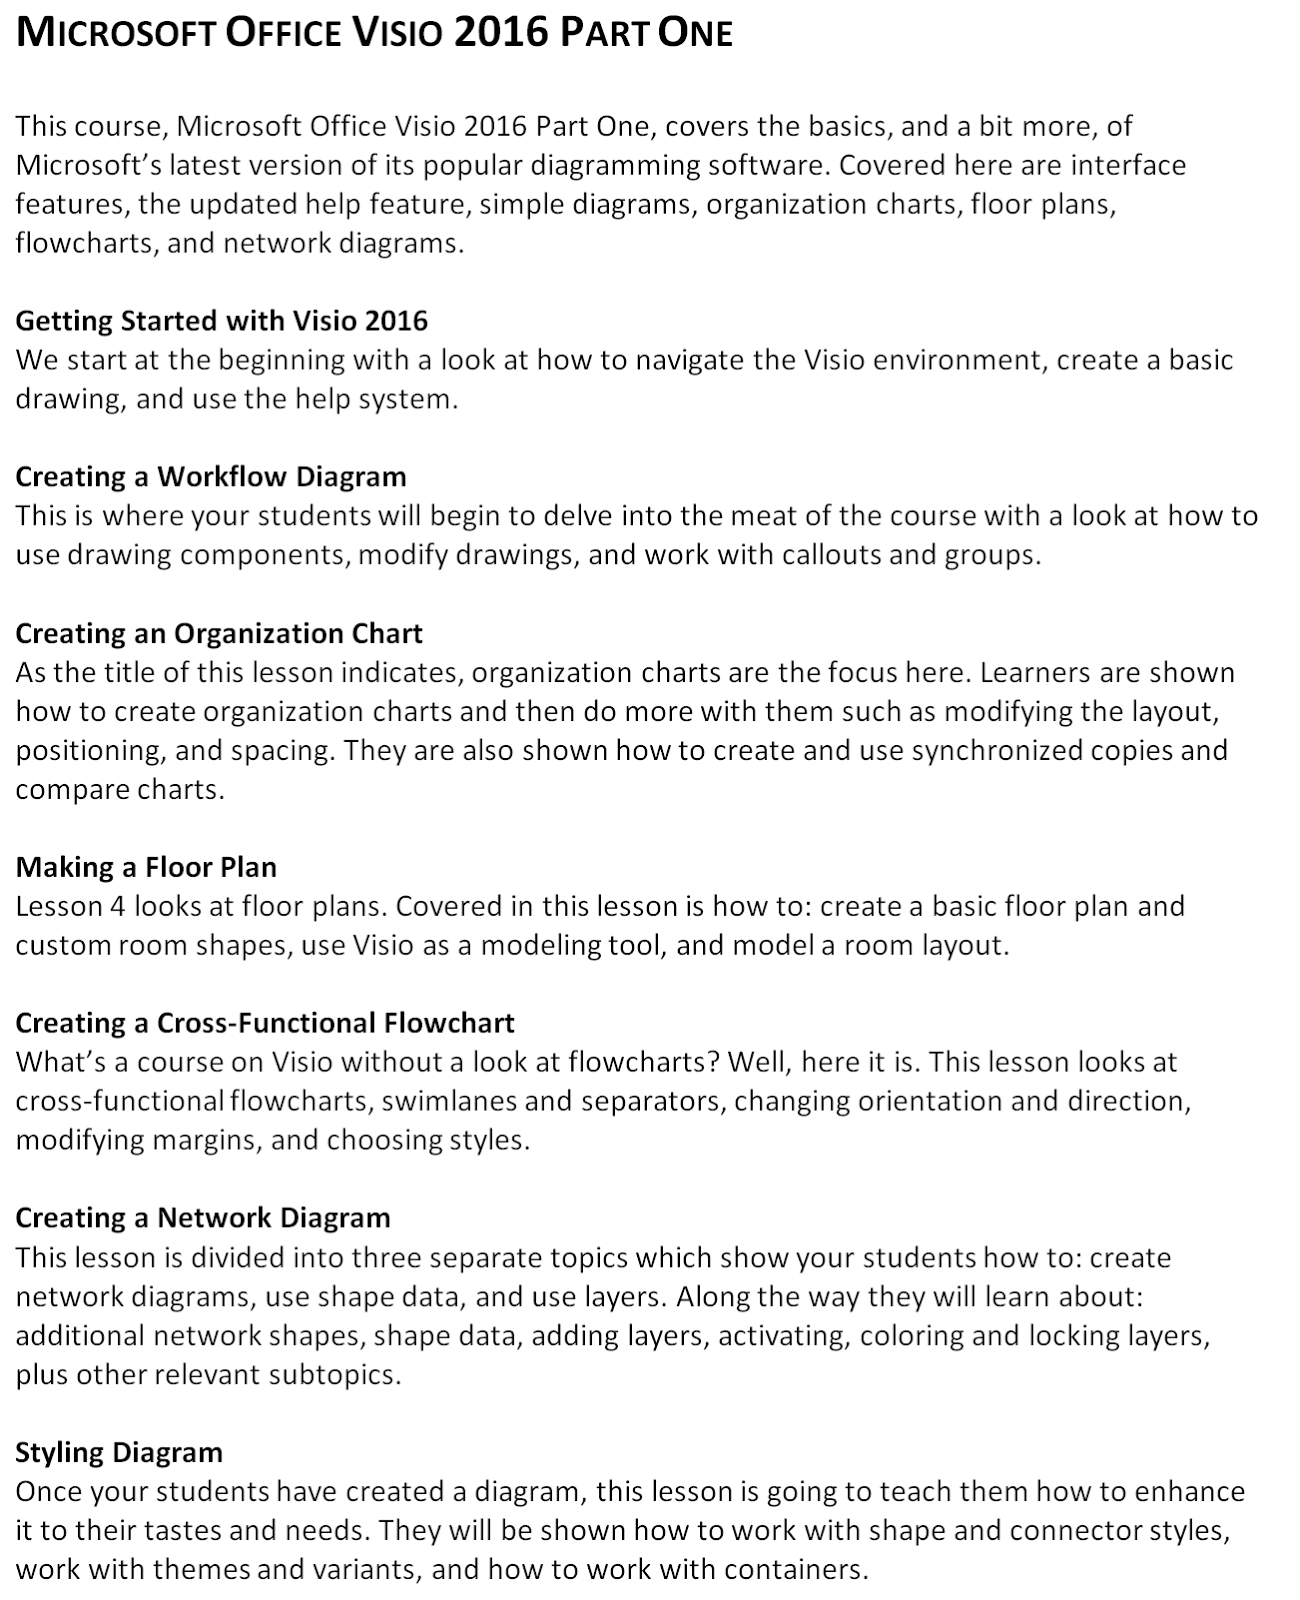 Mouse Training London Ltd: Microsoft Office - Visio 2016 Part 1